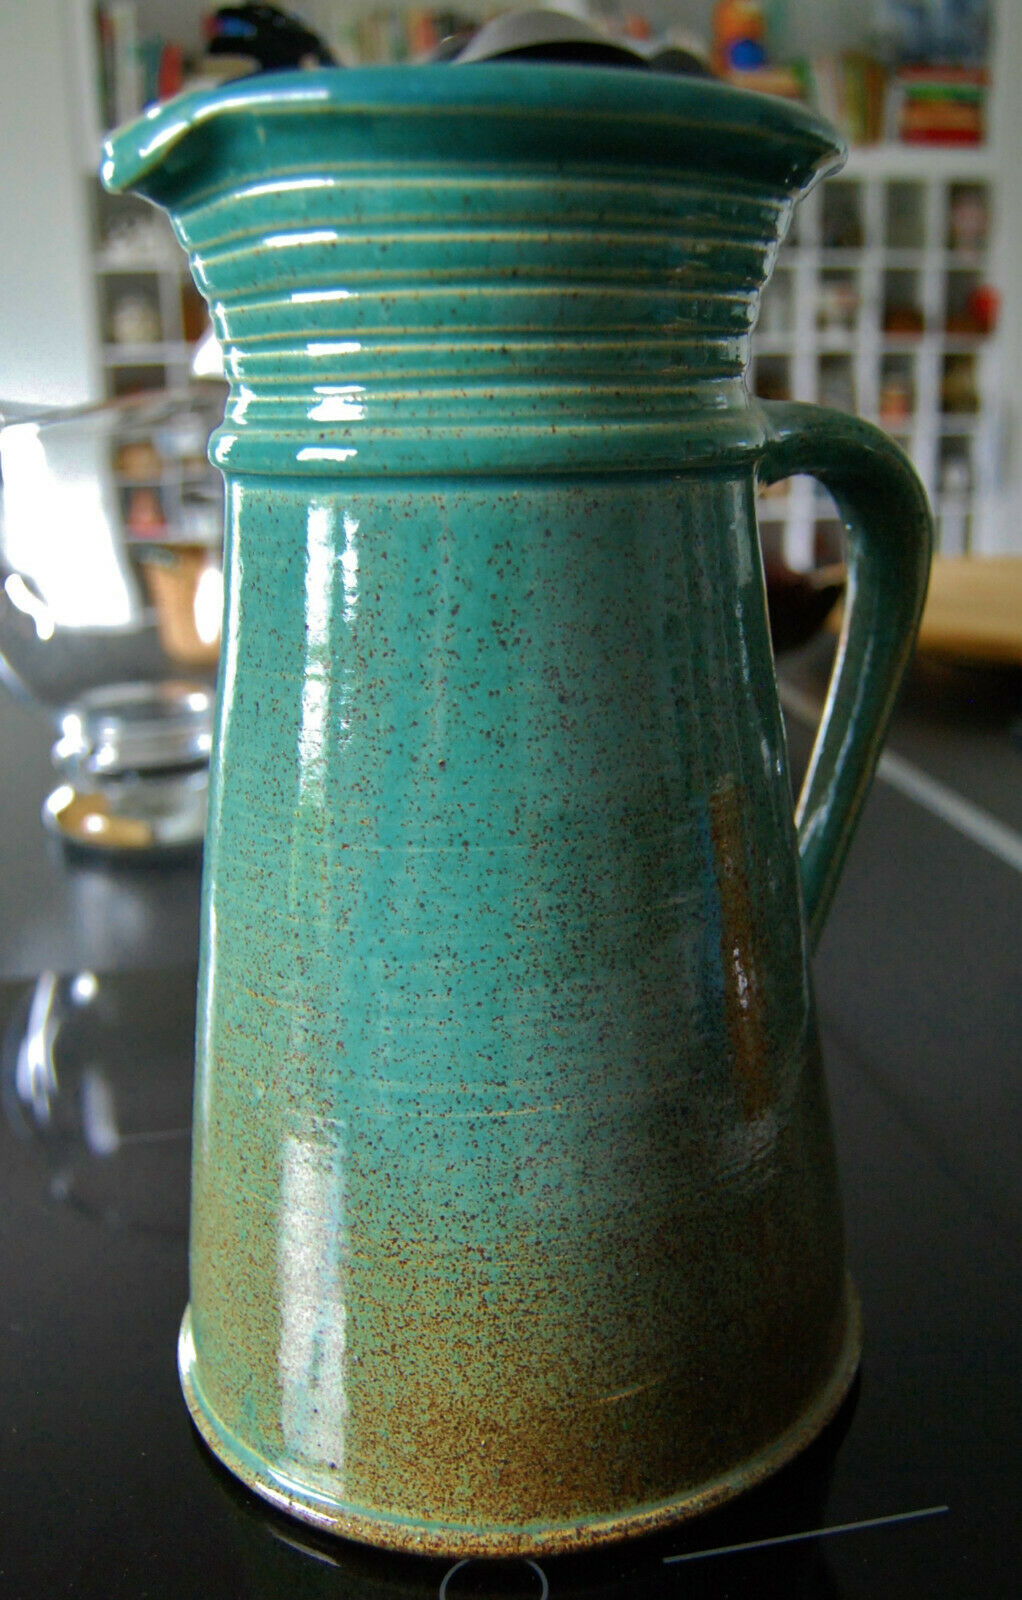 Landhausstil  Kanne Saft-Krug  handgearbeitet  Studio-Keramik  art pottery 26 cm